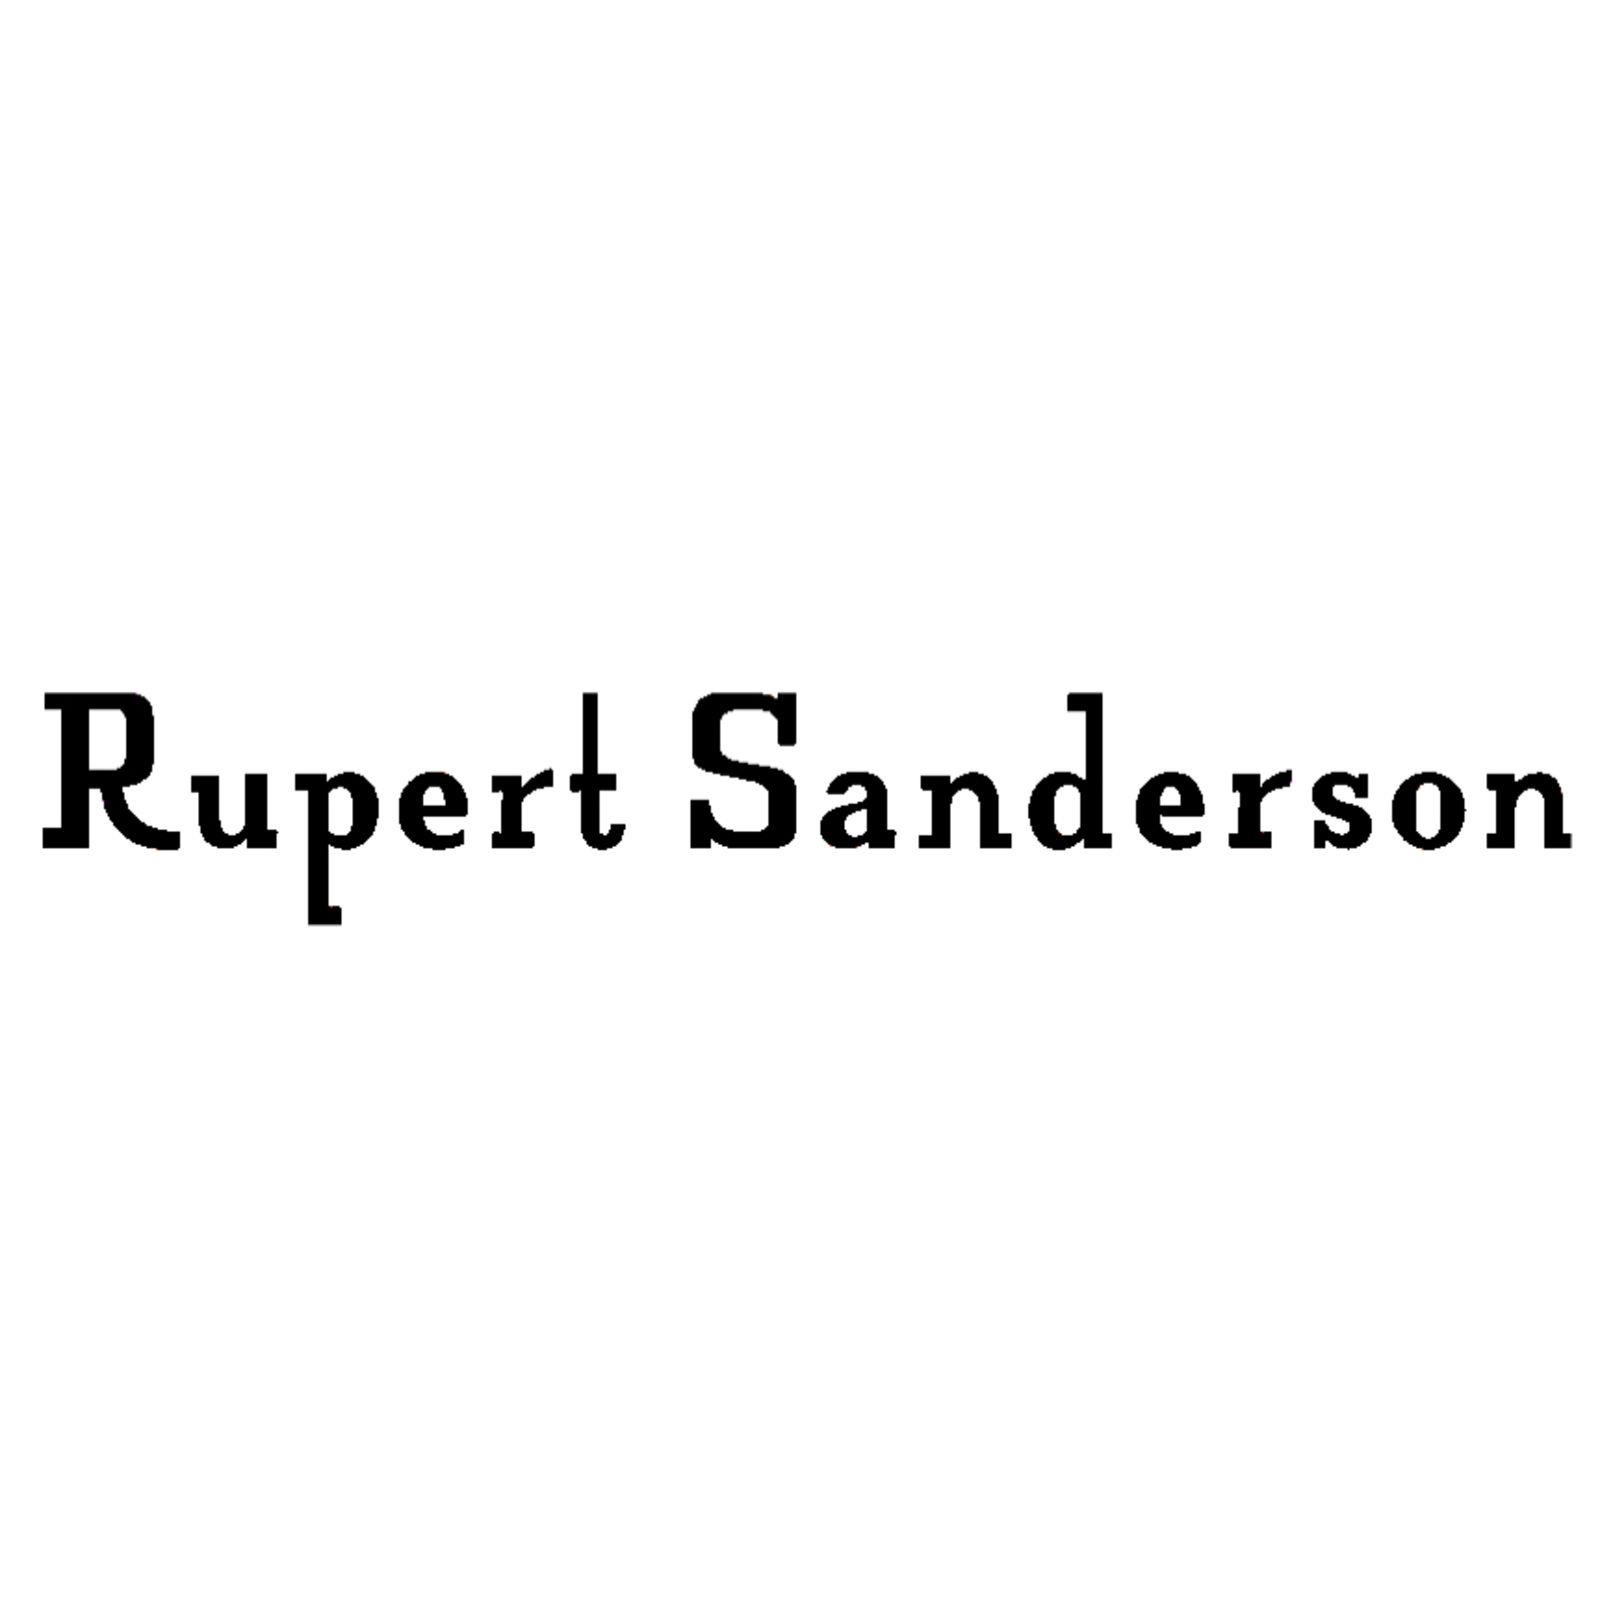 Rupert Sanderson (Bild 1)